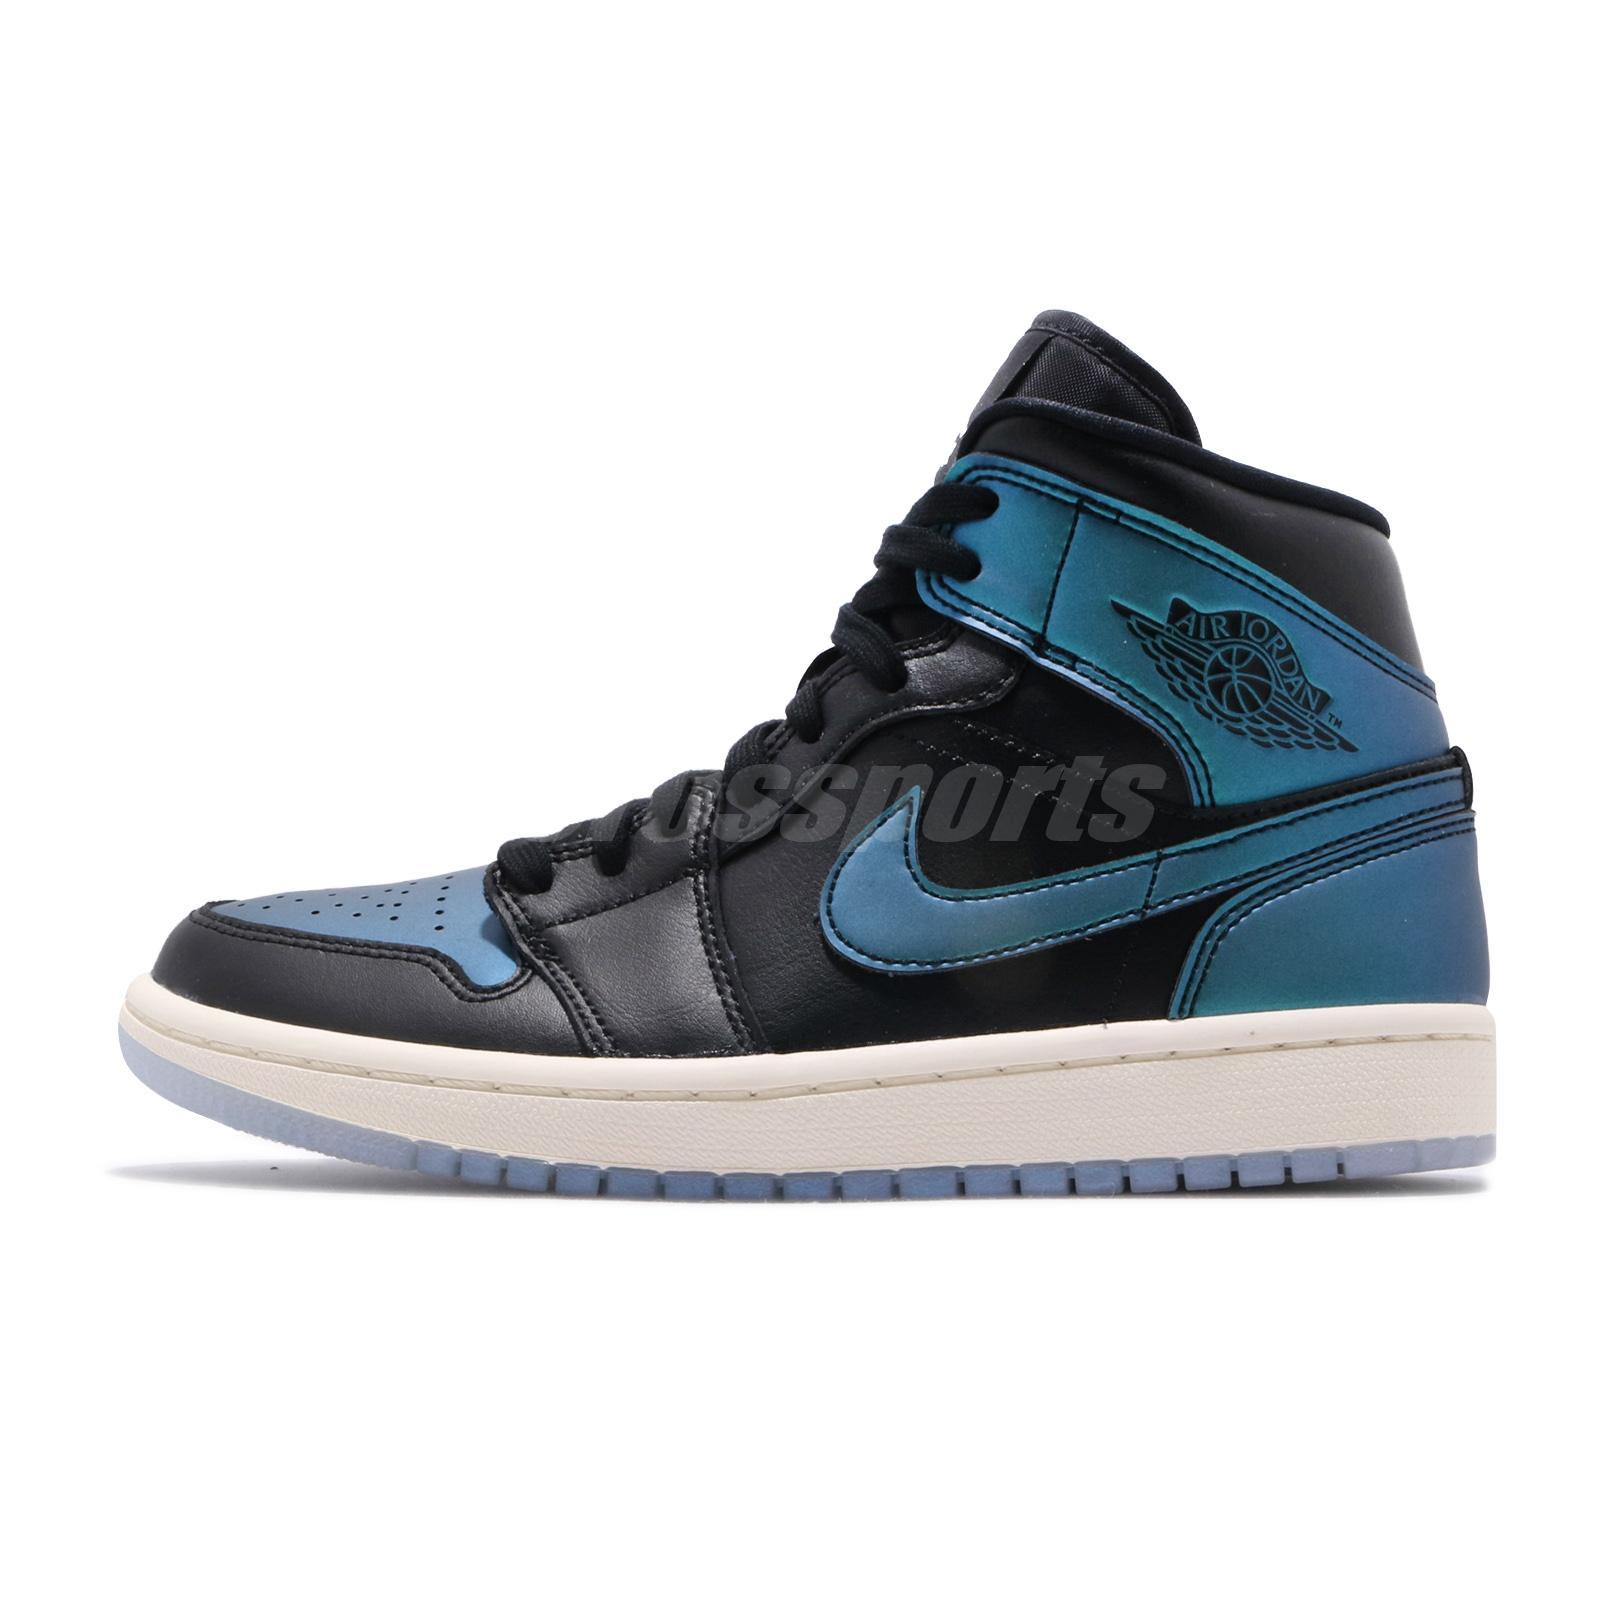 Zapatillas Nike WMNS AIR JORDAN 1 MID